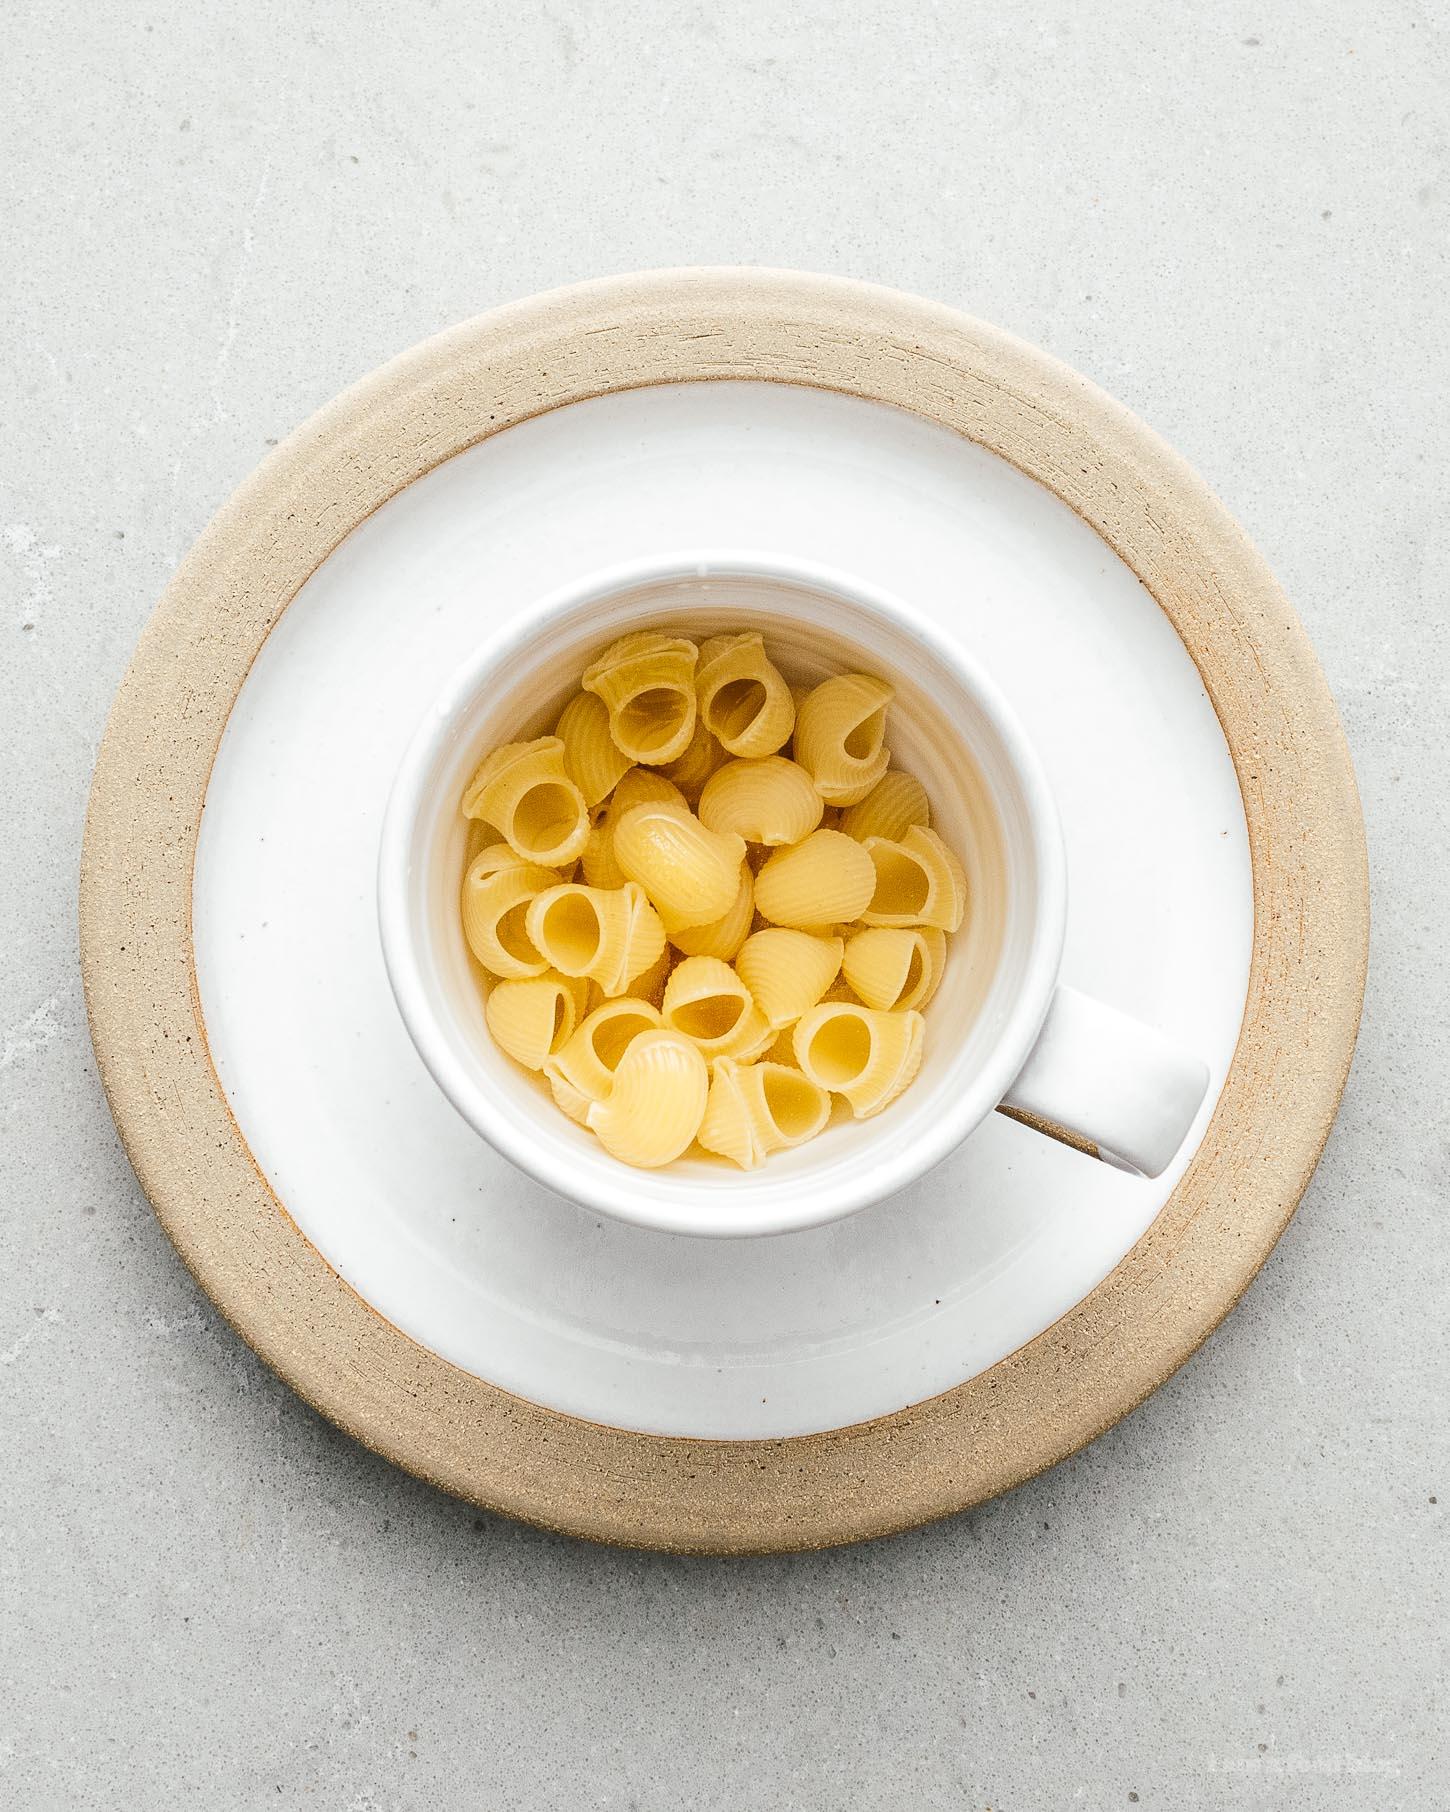 Dorm Room Microwave Mug Mac & Cheese   www.iamafoodblog.com